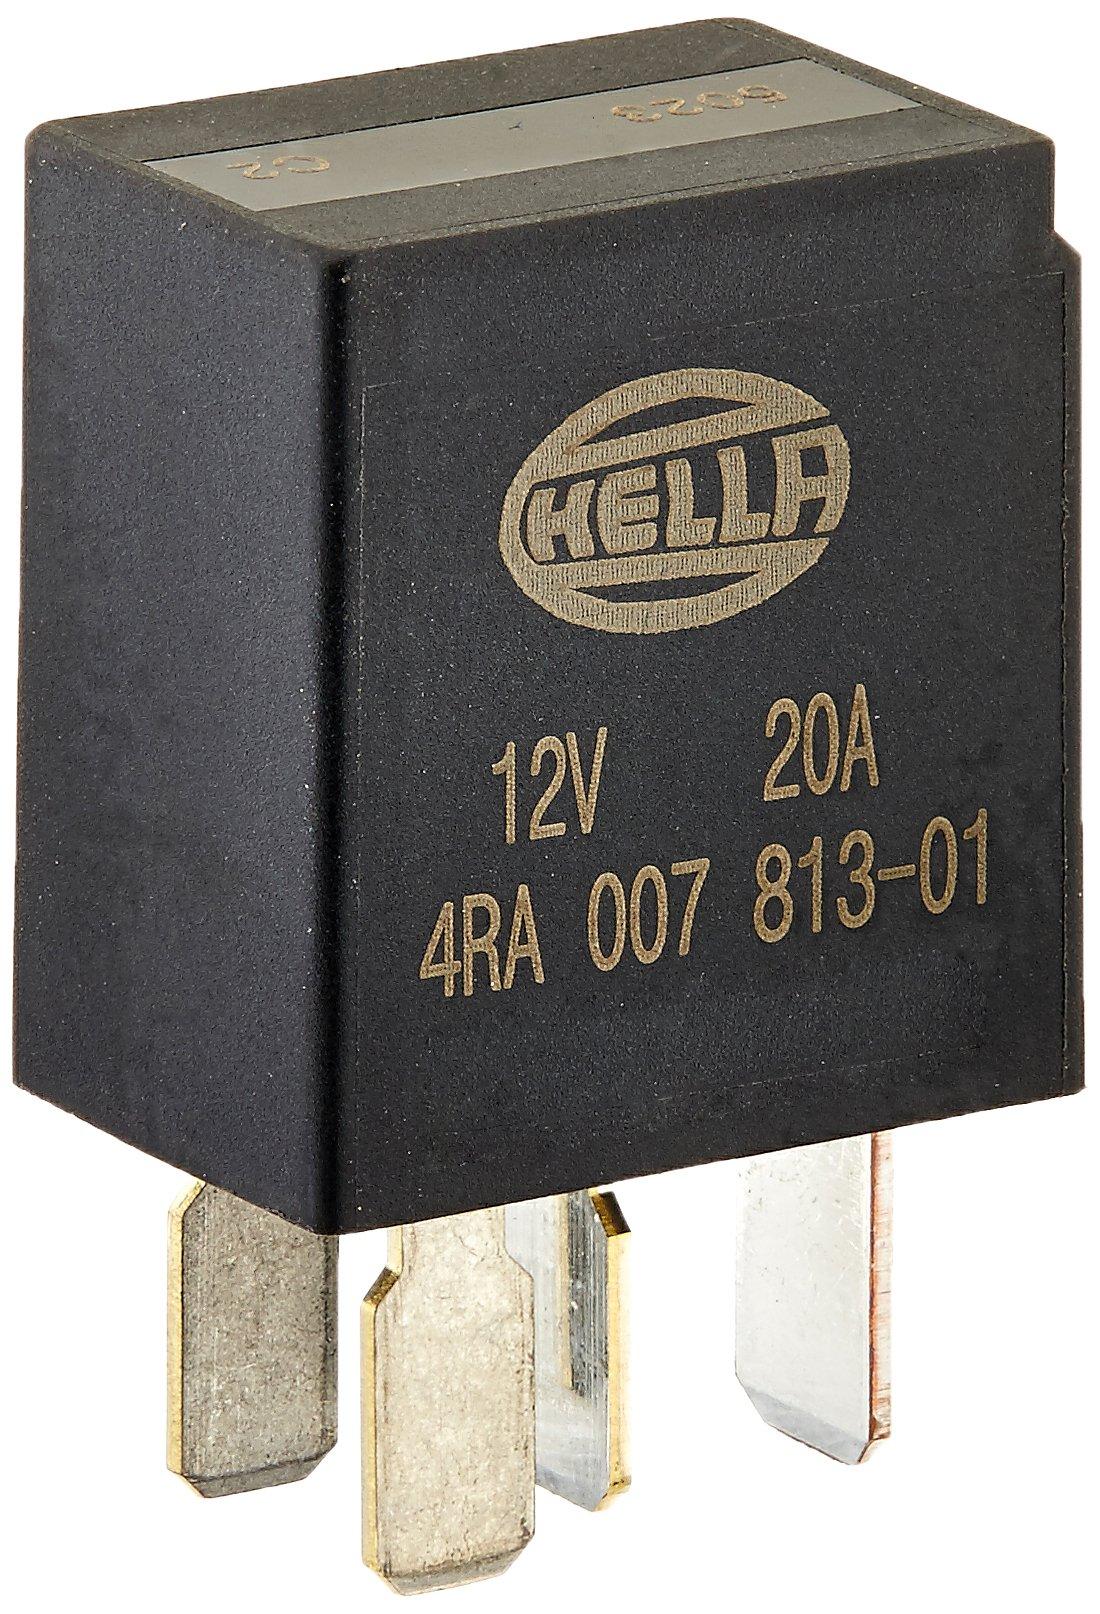 Hella 007903001 24v 10 20a Spdt Relay Black Wiring Diagram Lock